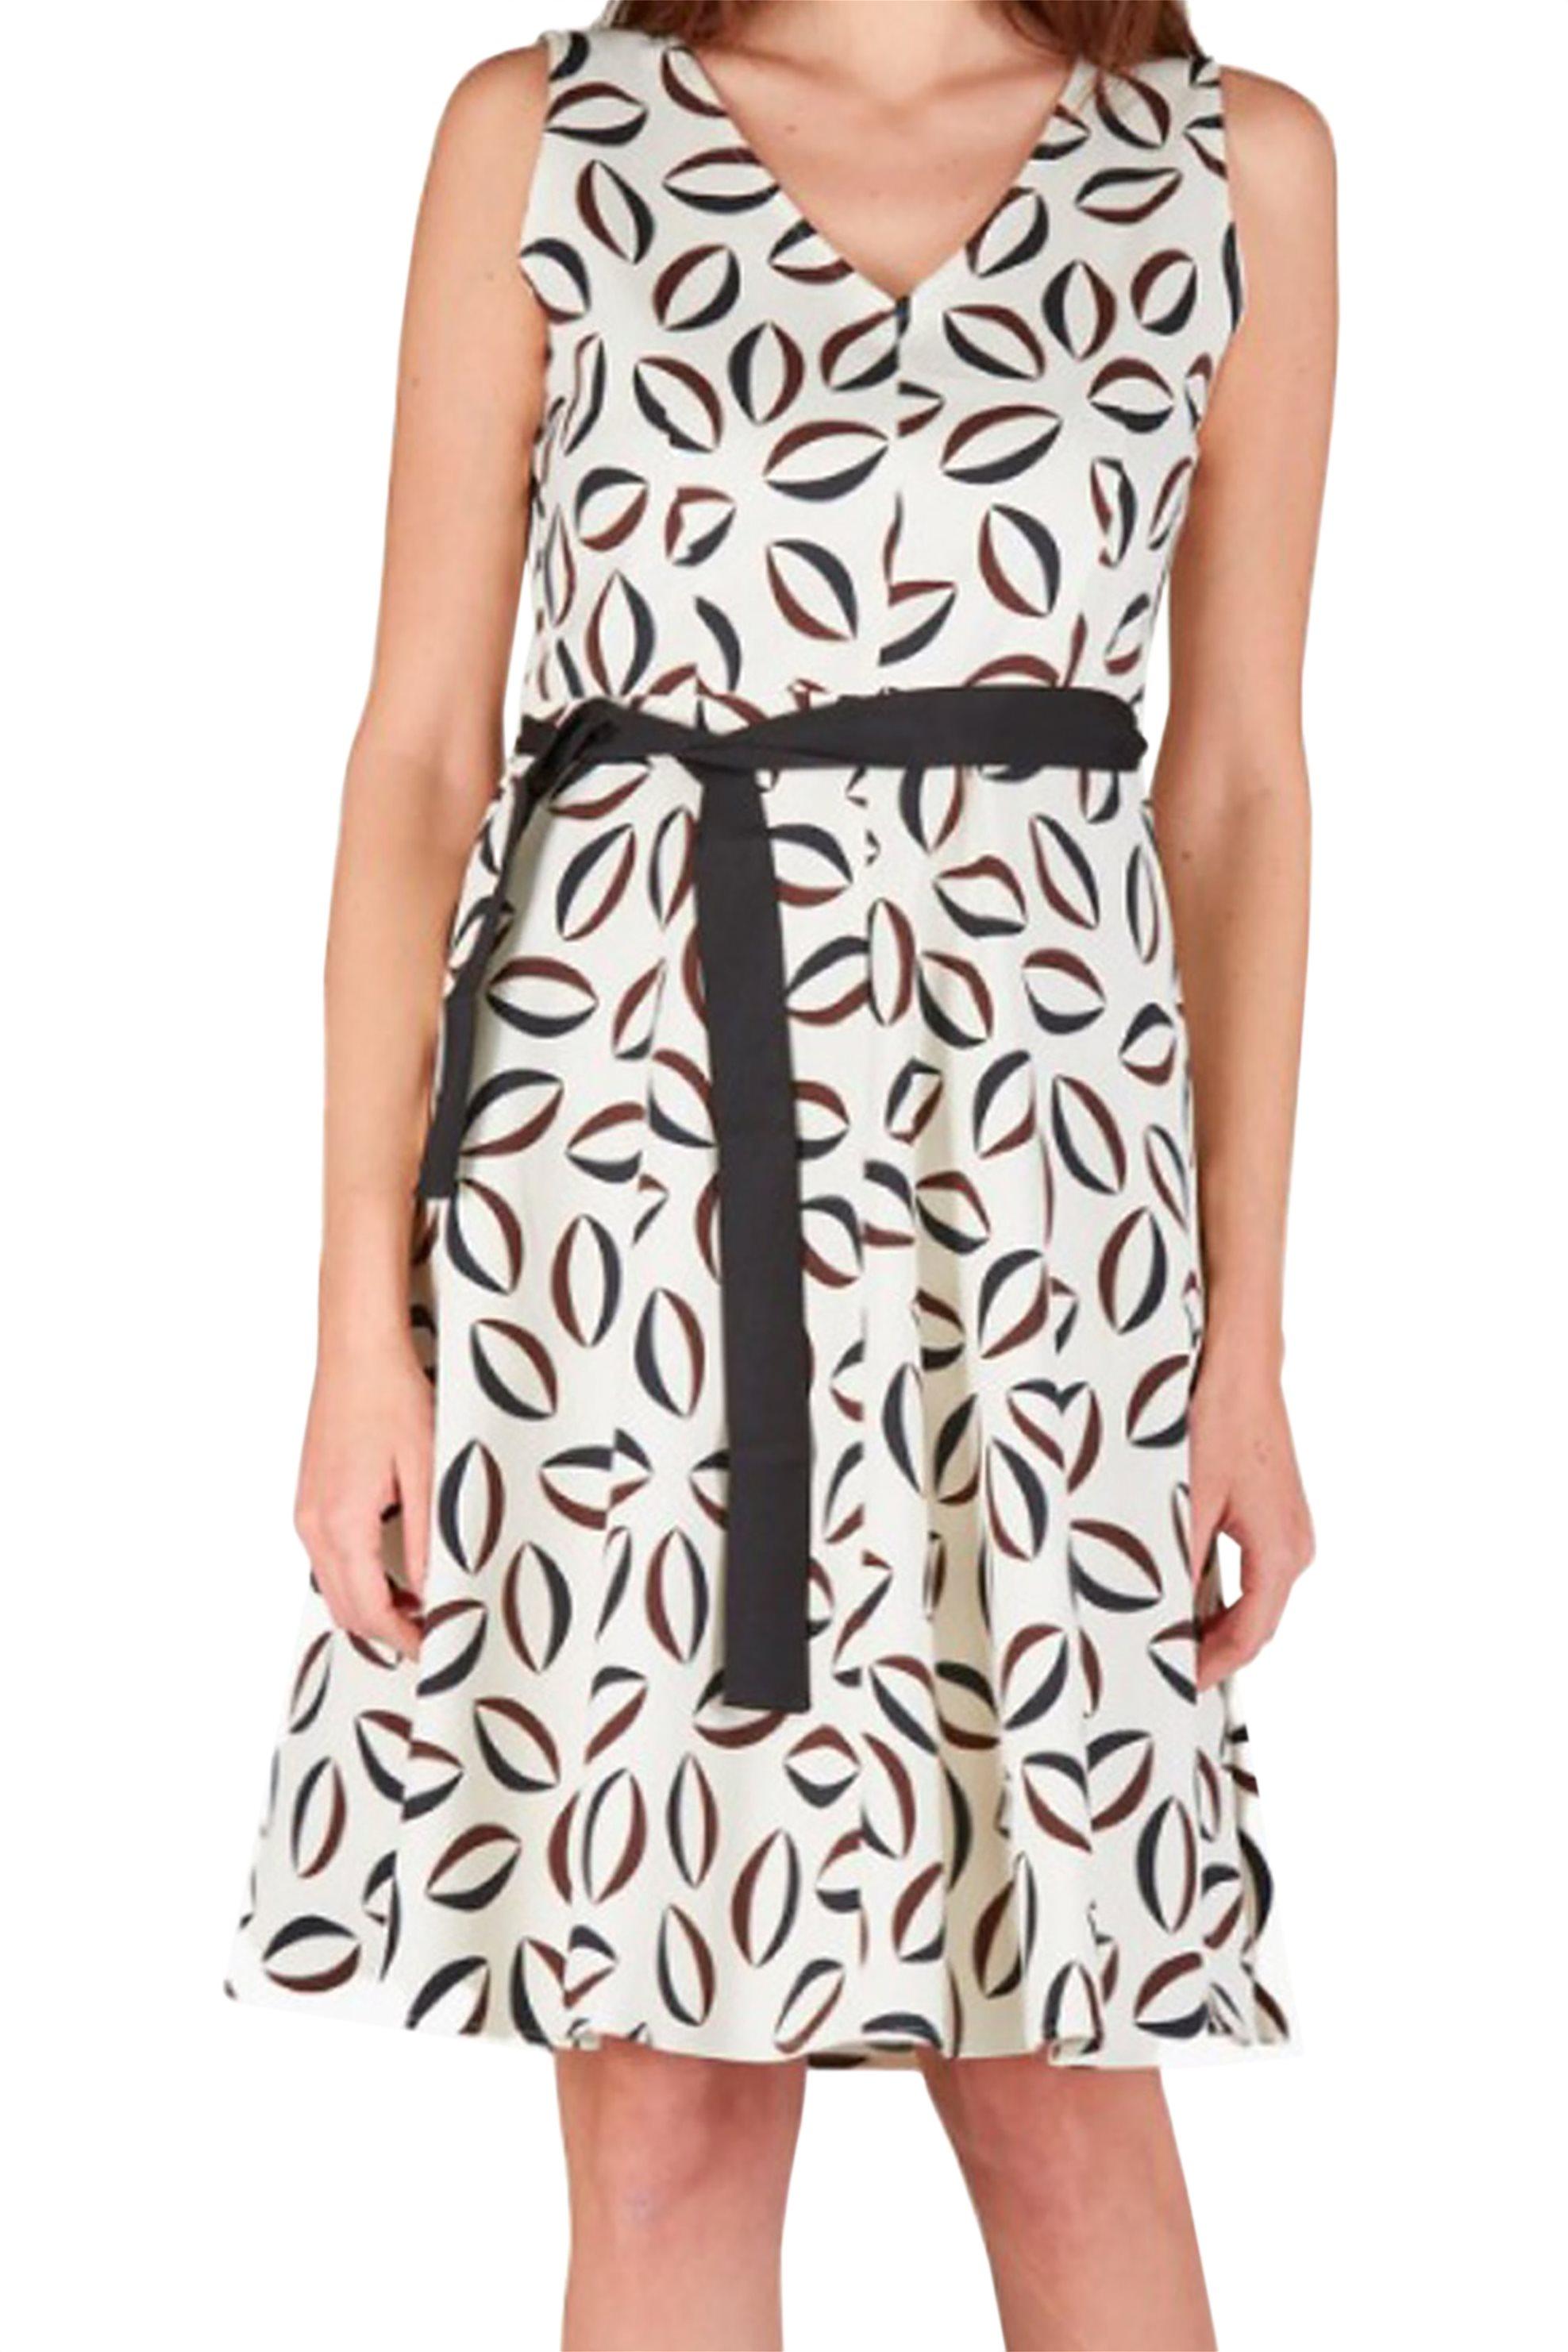 Emme by Marella γυναικείο mini φόρεμα με print